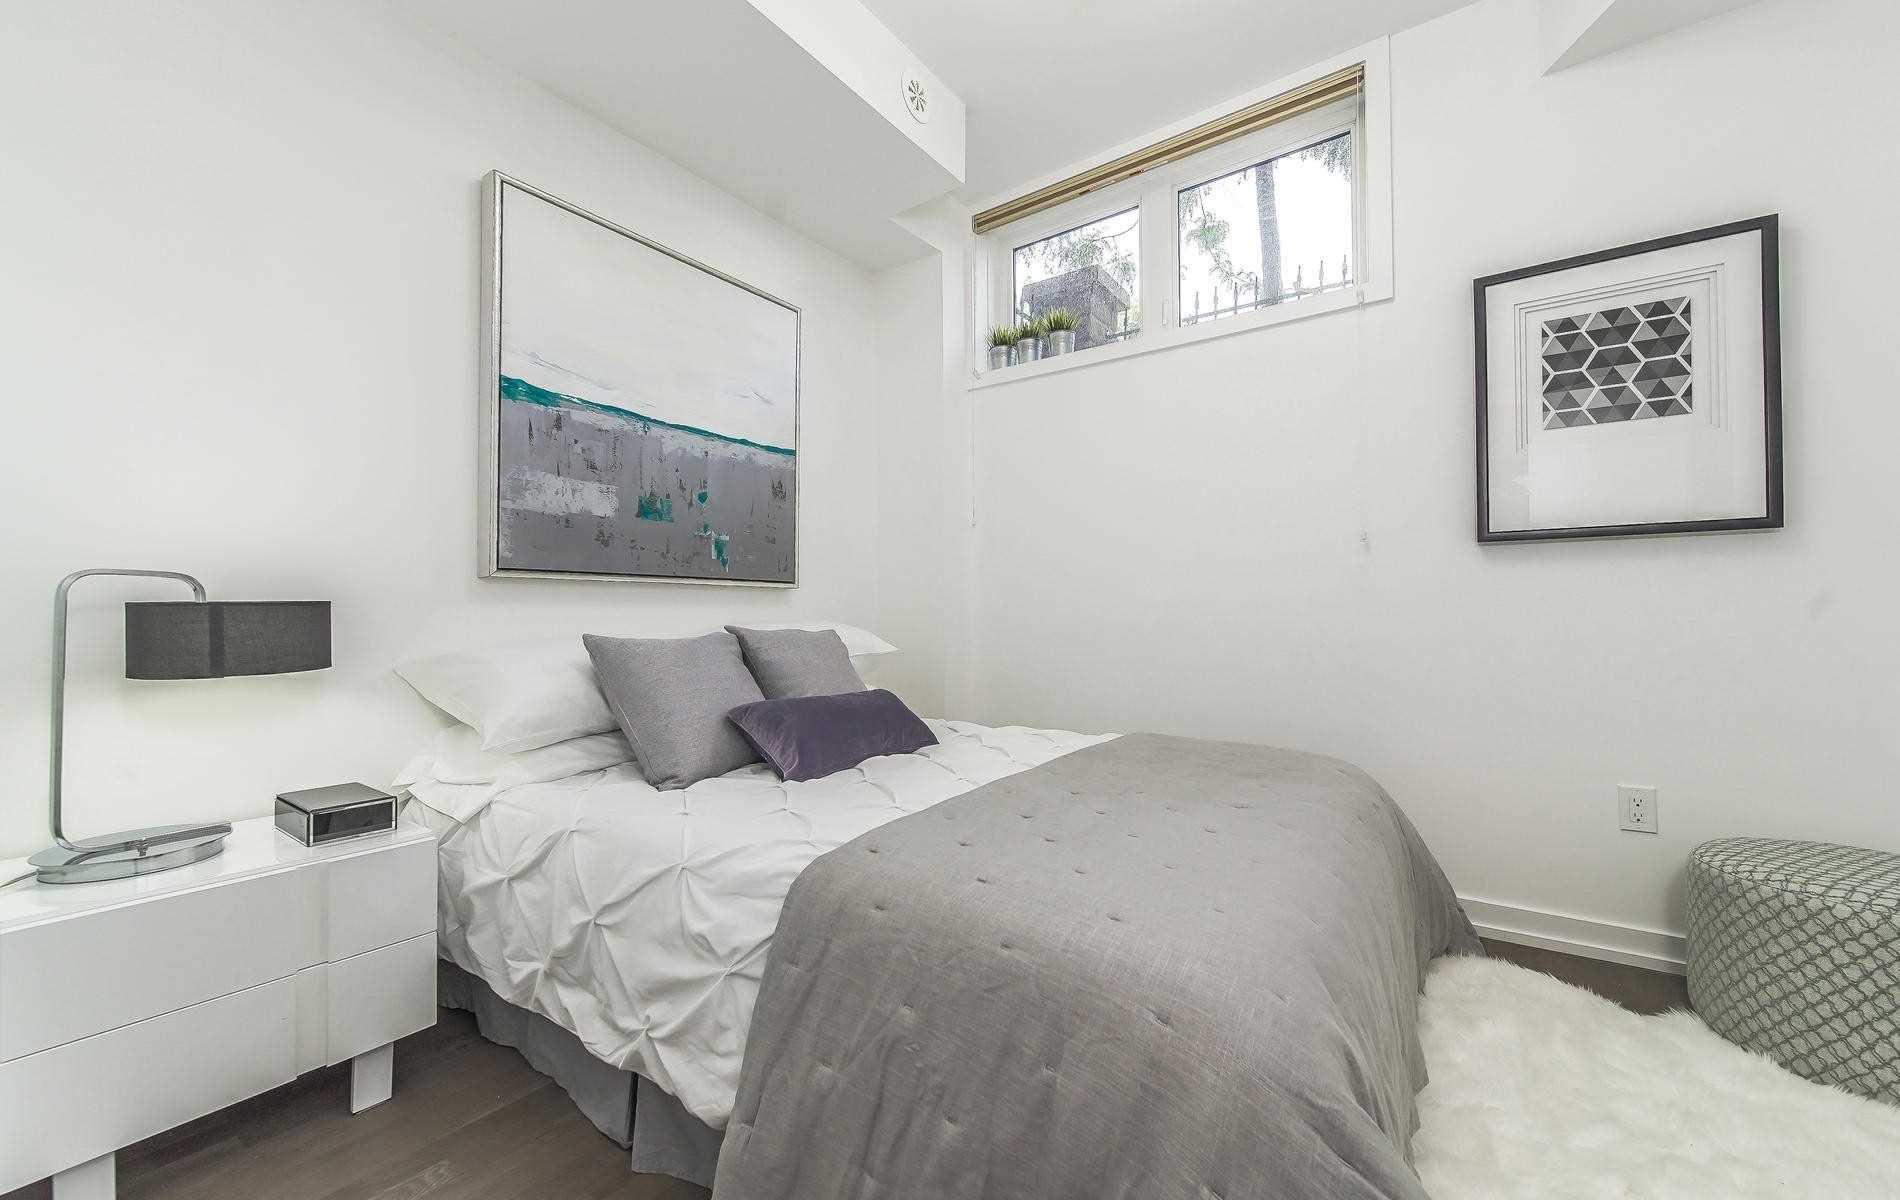 Photo 9: Photos: Th 11 150 Broadview Avenue in Toronto: South Riverdale Condo for sale (Toronto E01)  : MLS®# E4519038